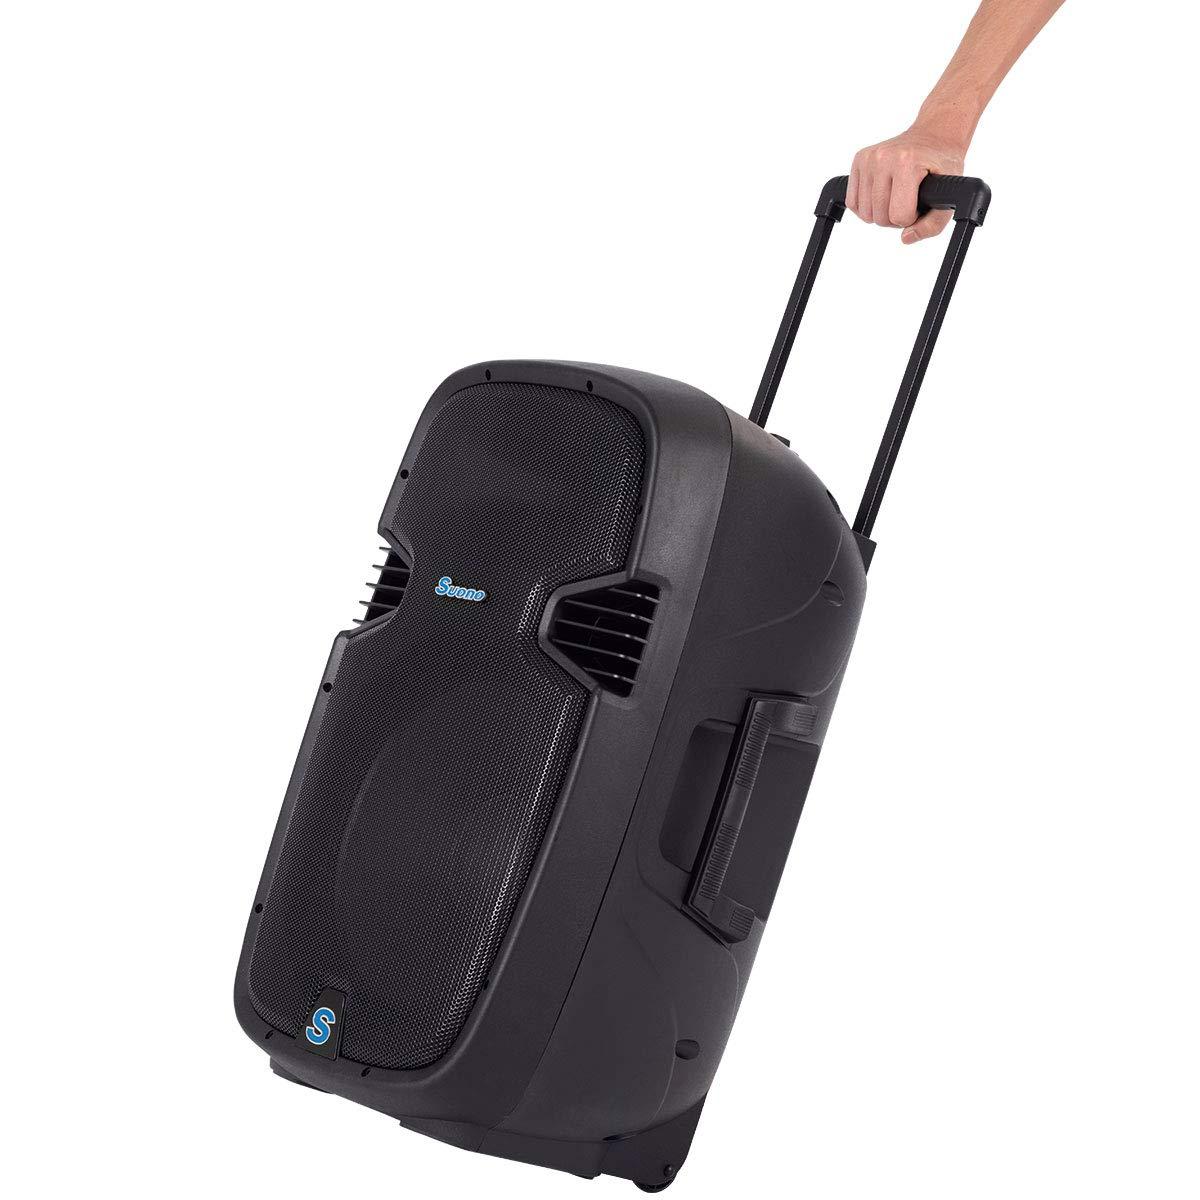 Suono Powered Speakers, 2-Way Full Range Portable DJ/PA Speaker System Set With Microphones/USB/Bluetooth (15'' 1000W) by Suono (Image #6)